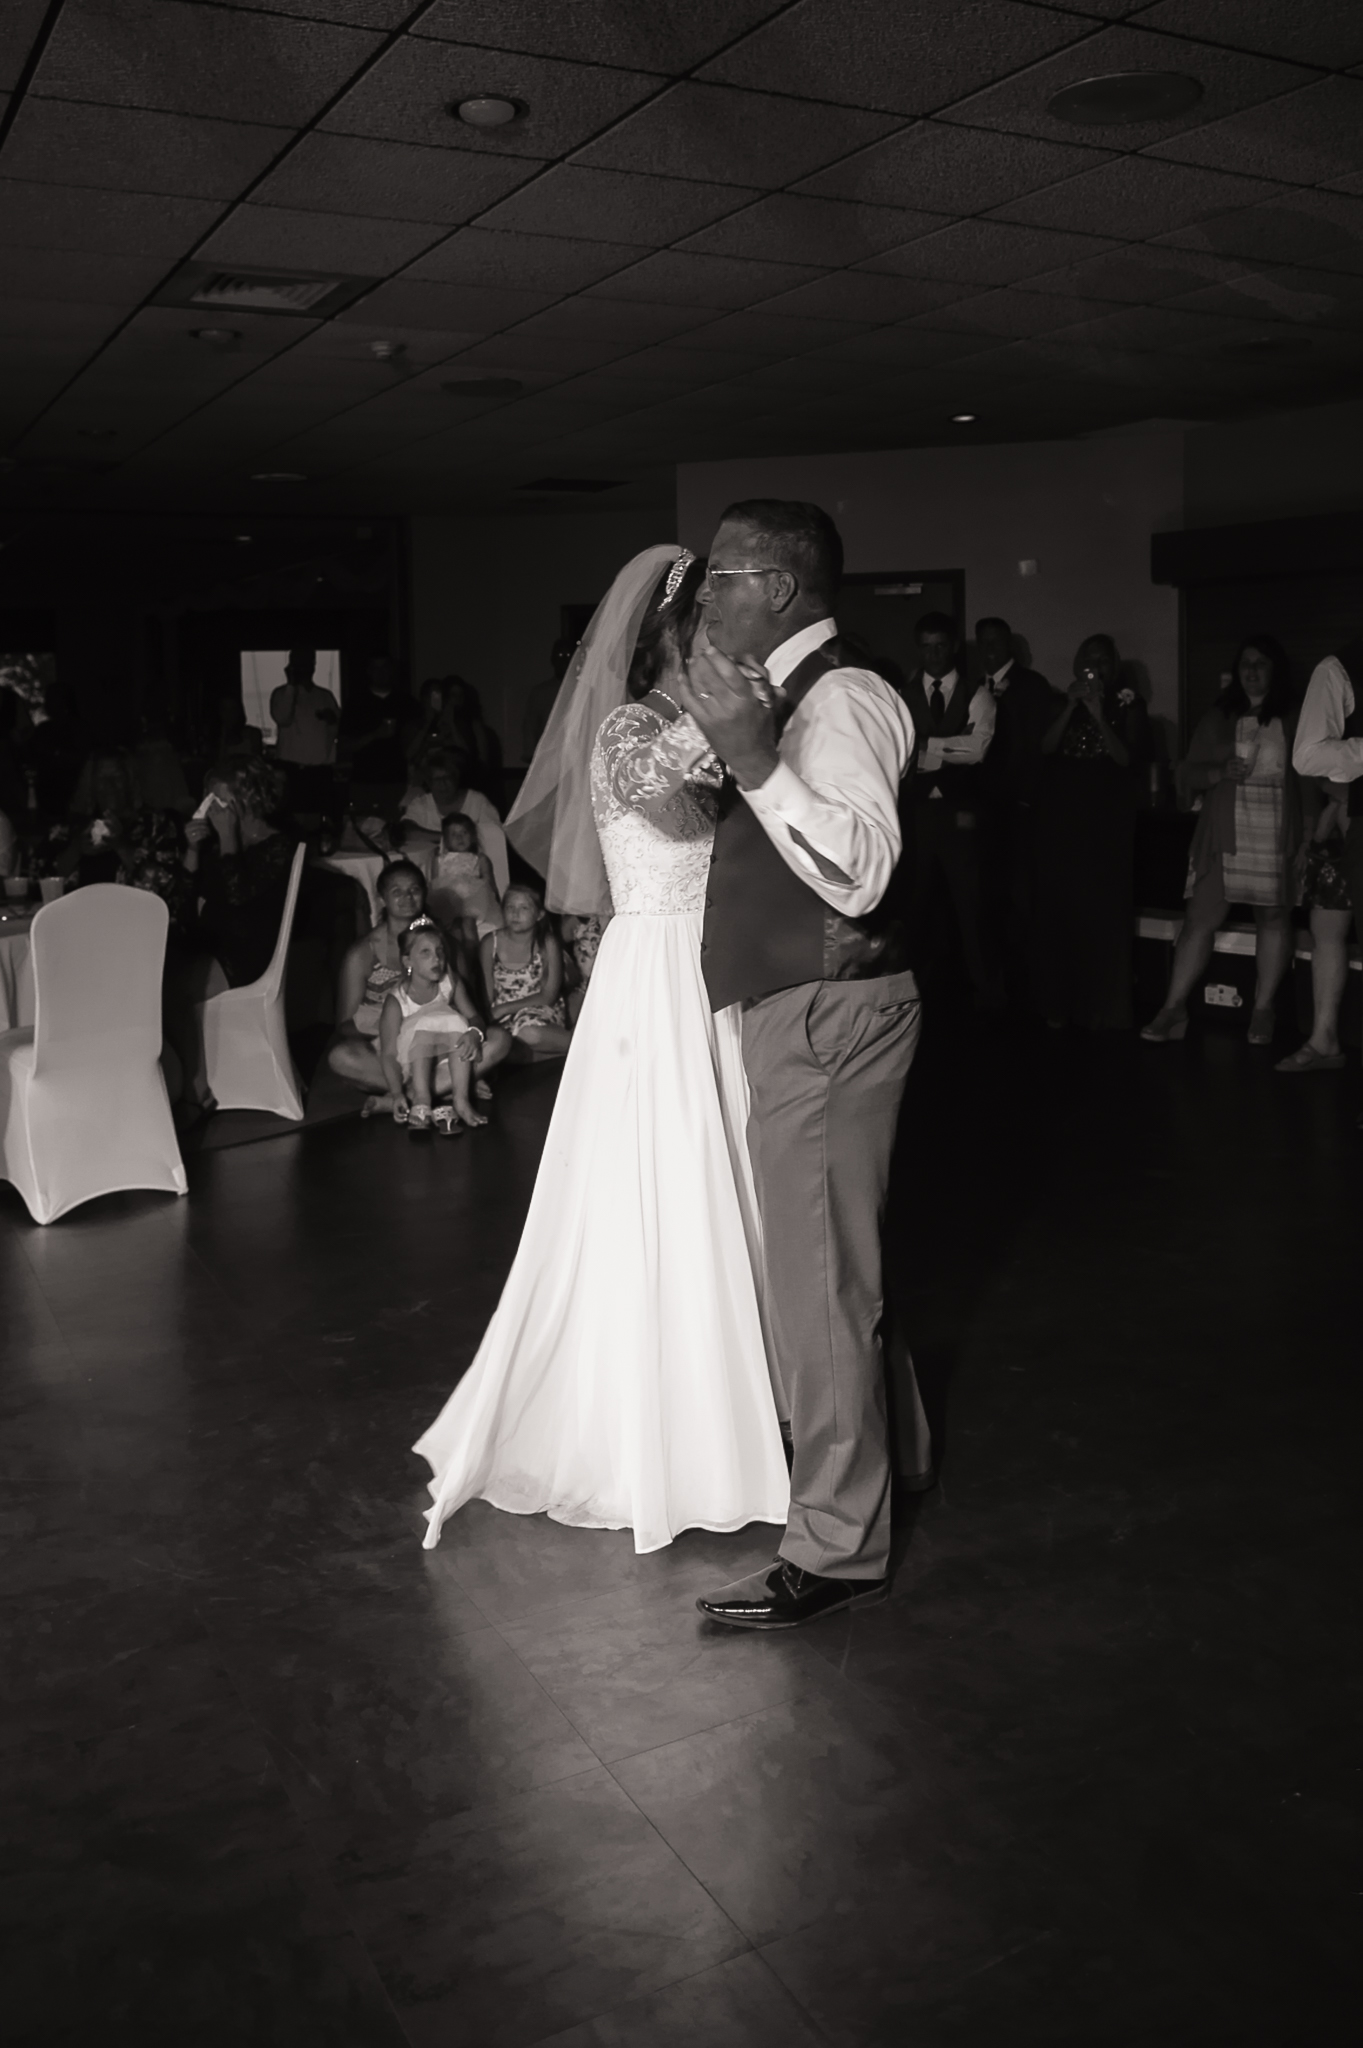 47-ashland washburn wedding photography700_6189.jpg